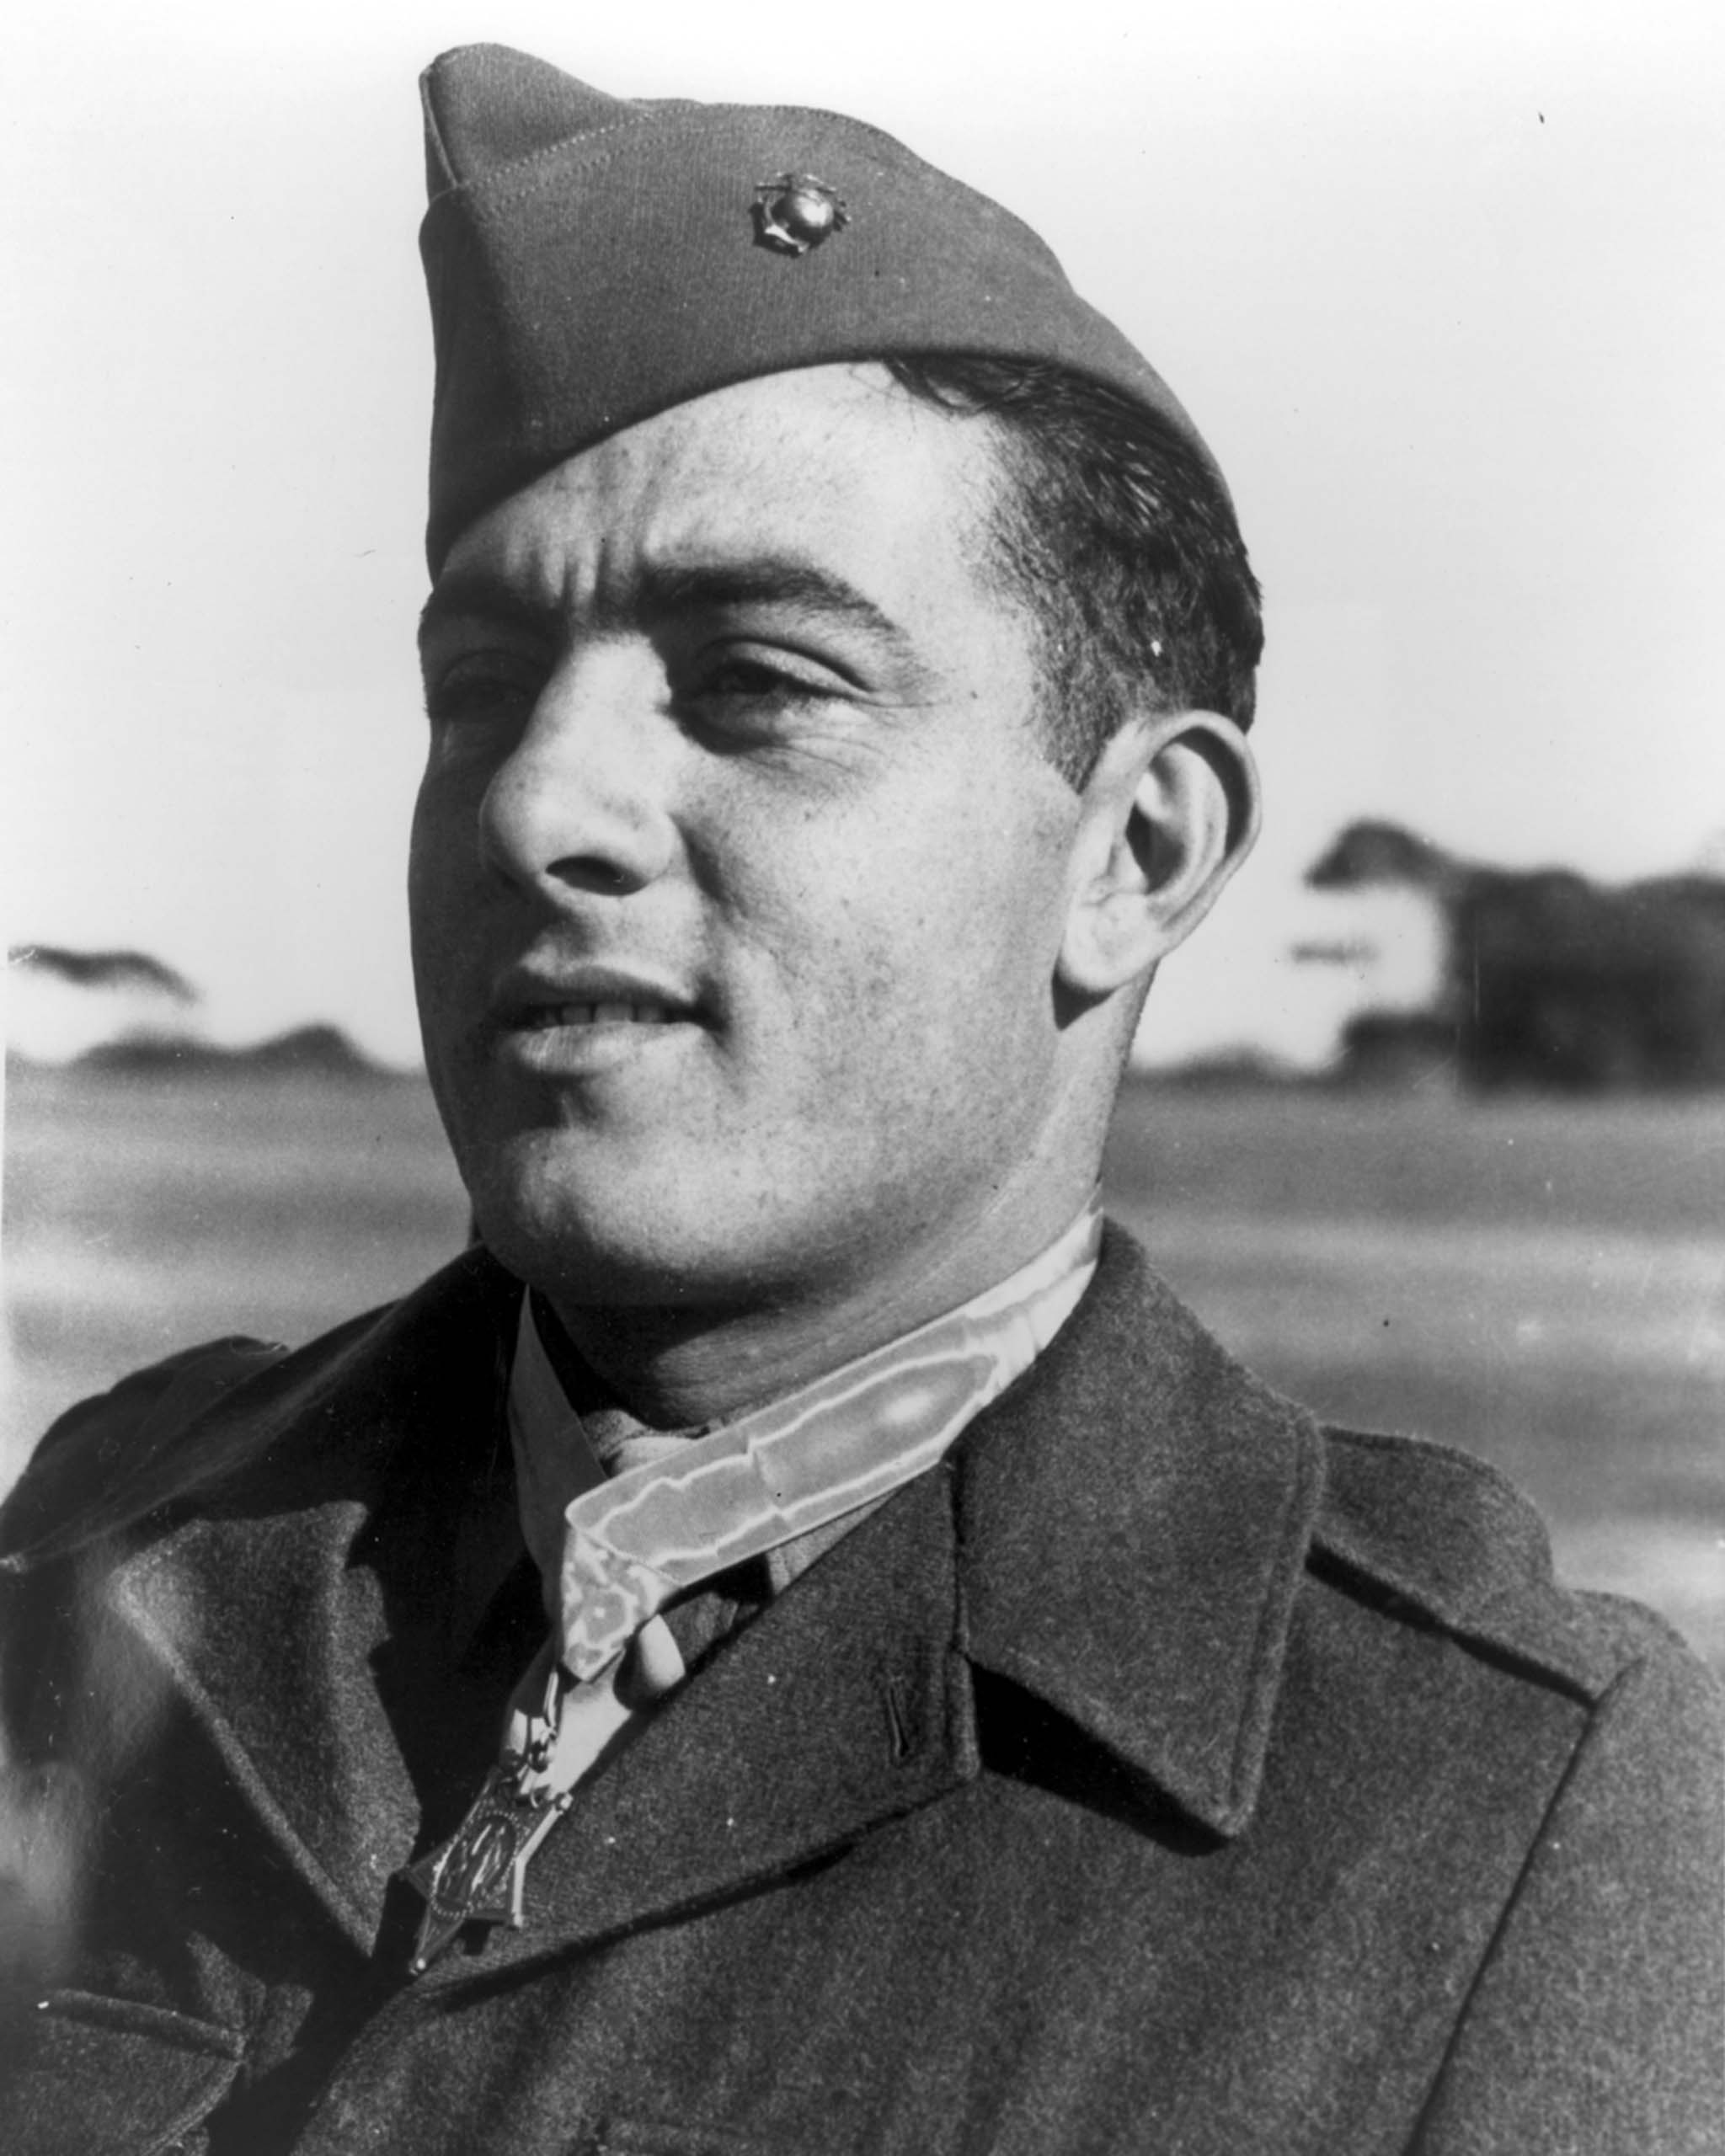 Sergeant John Basilone